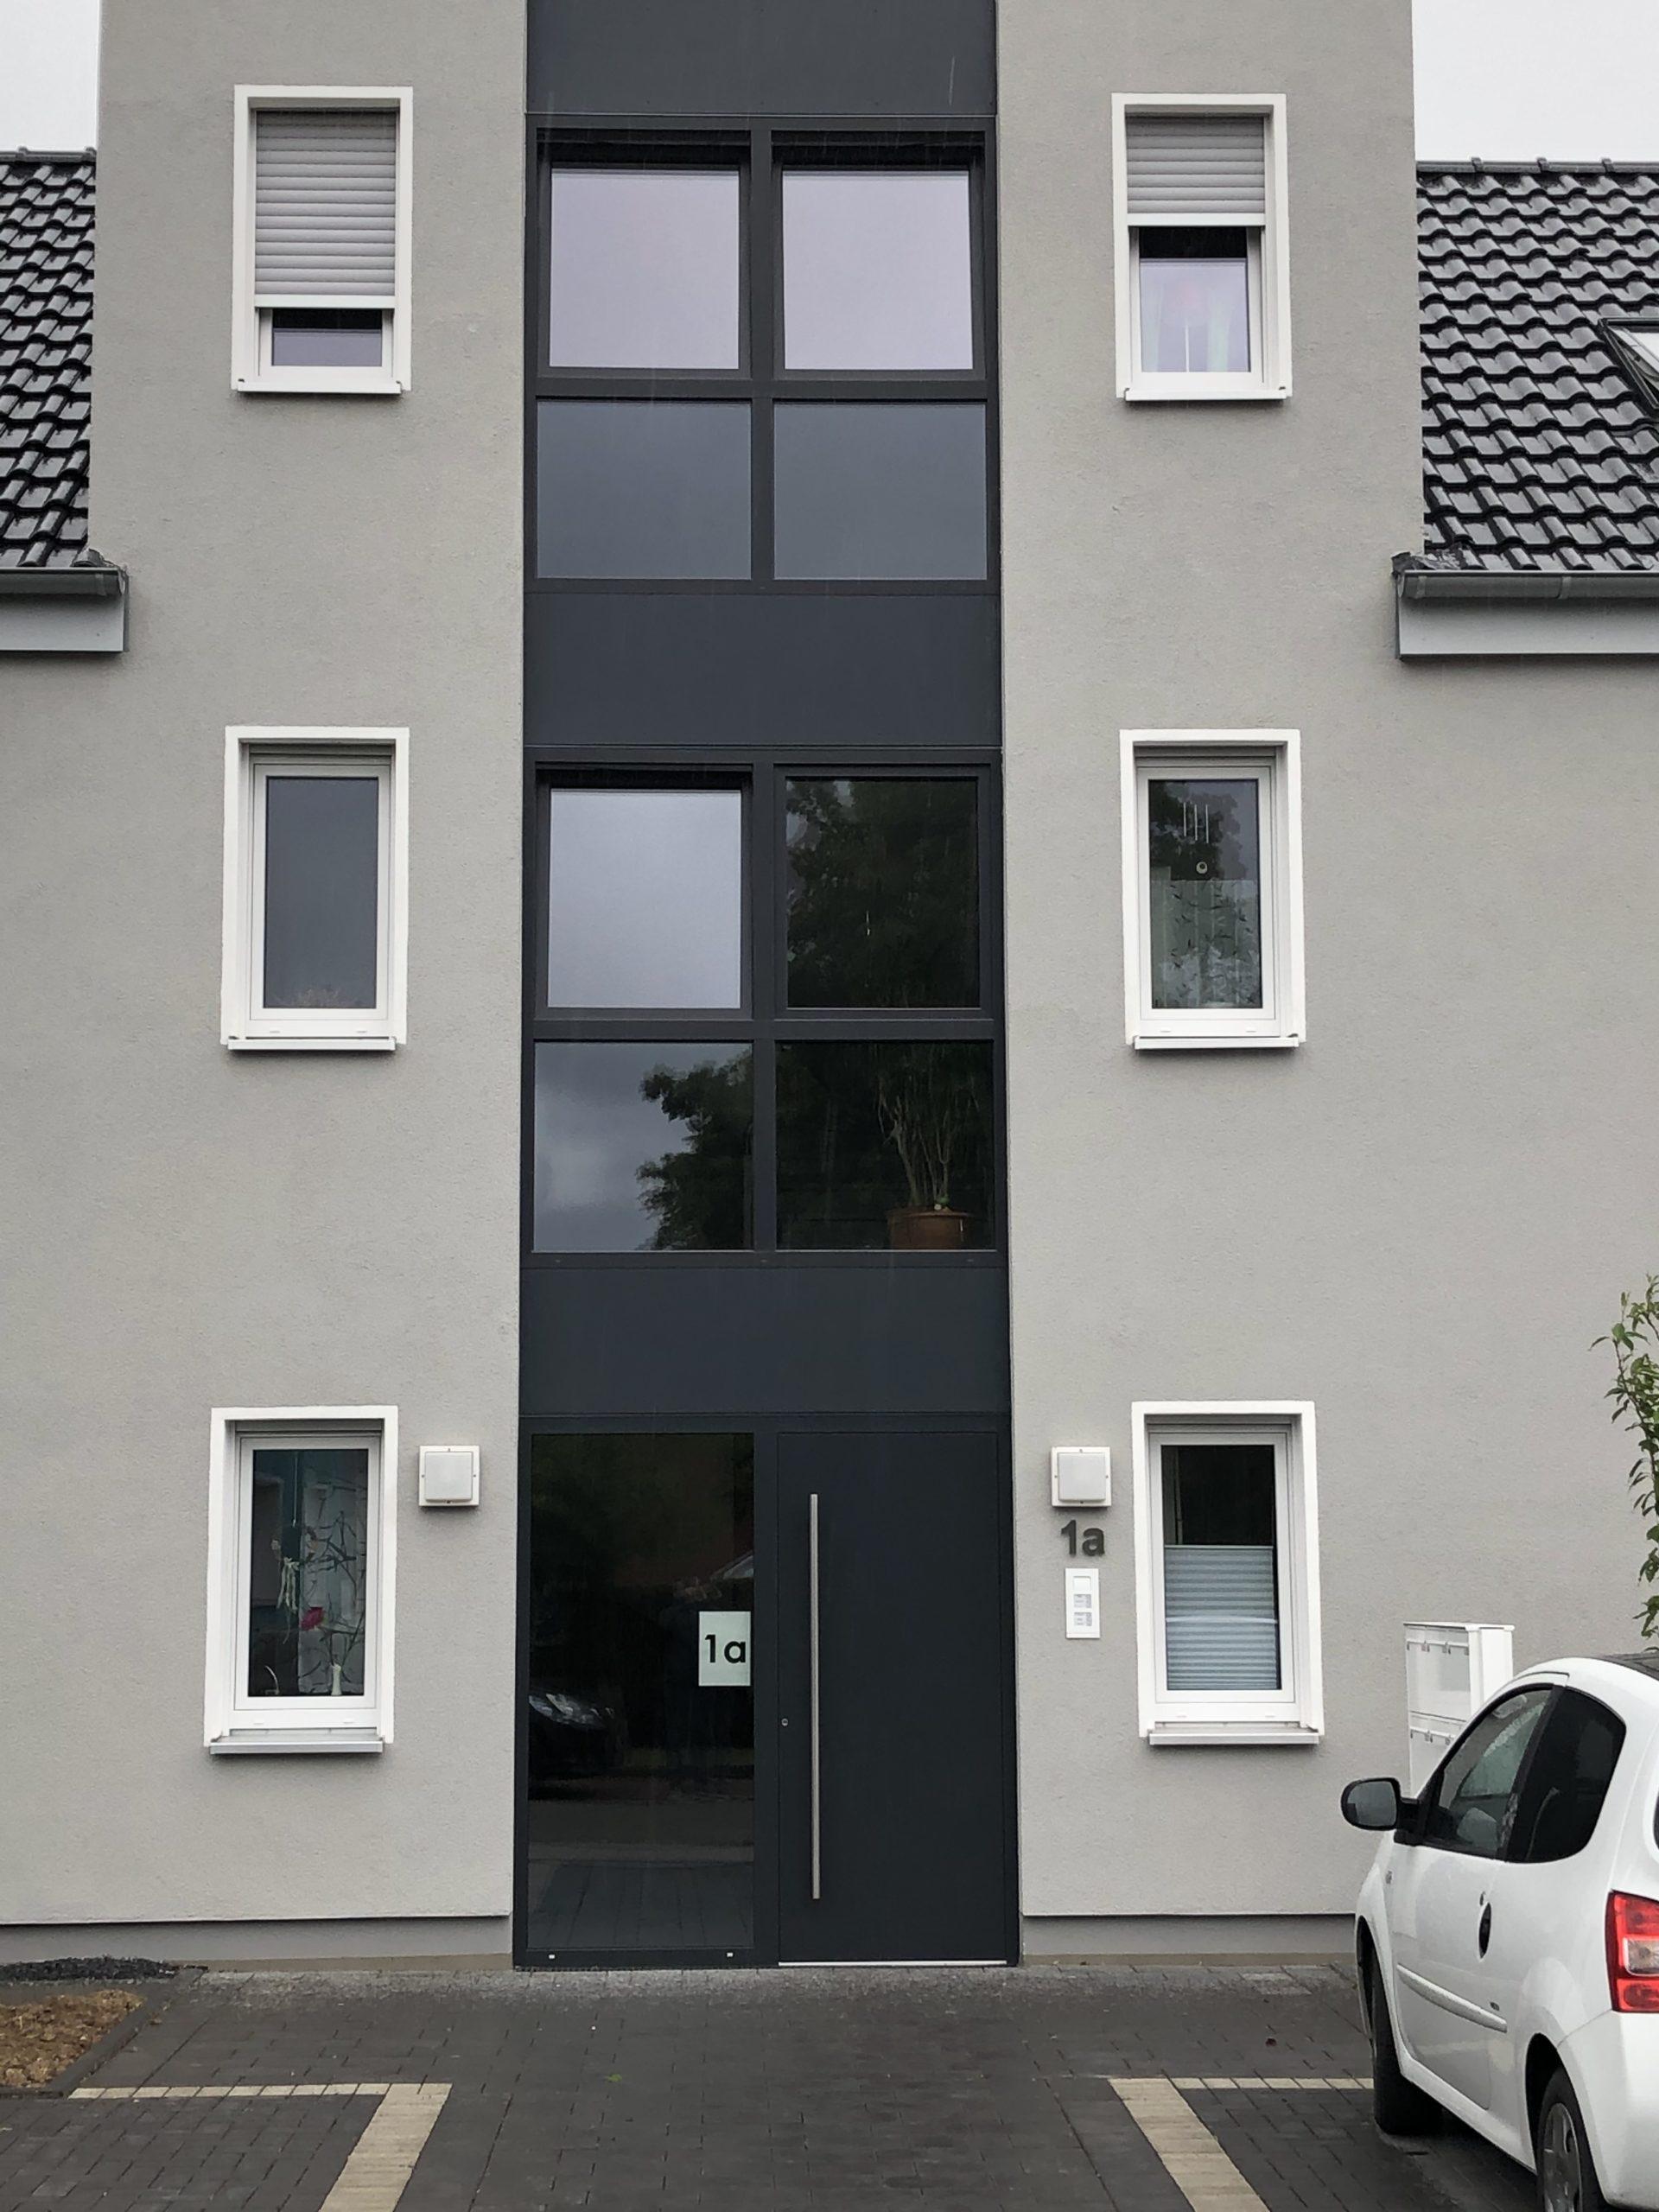 Hausfront eines Mehrfamilienhauses